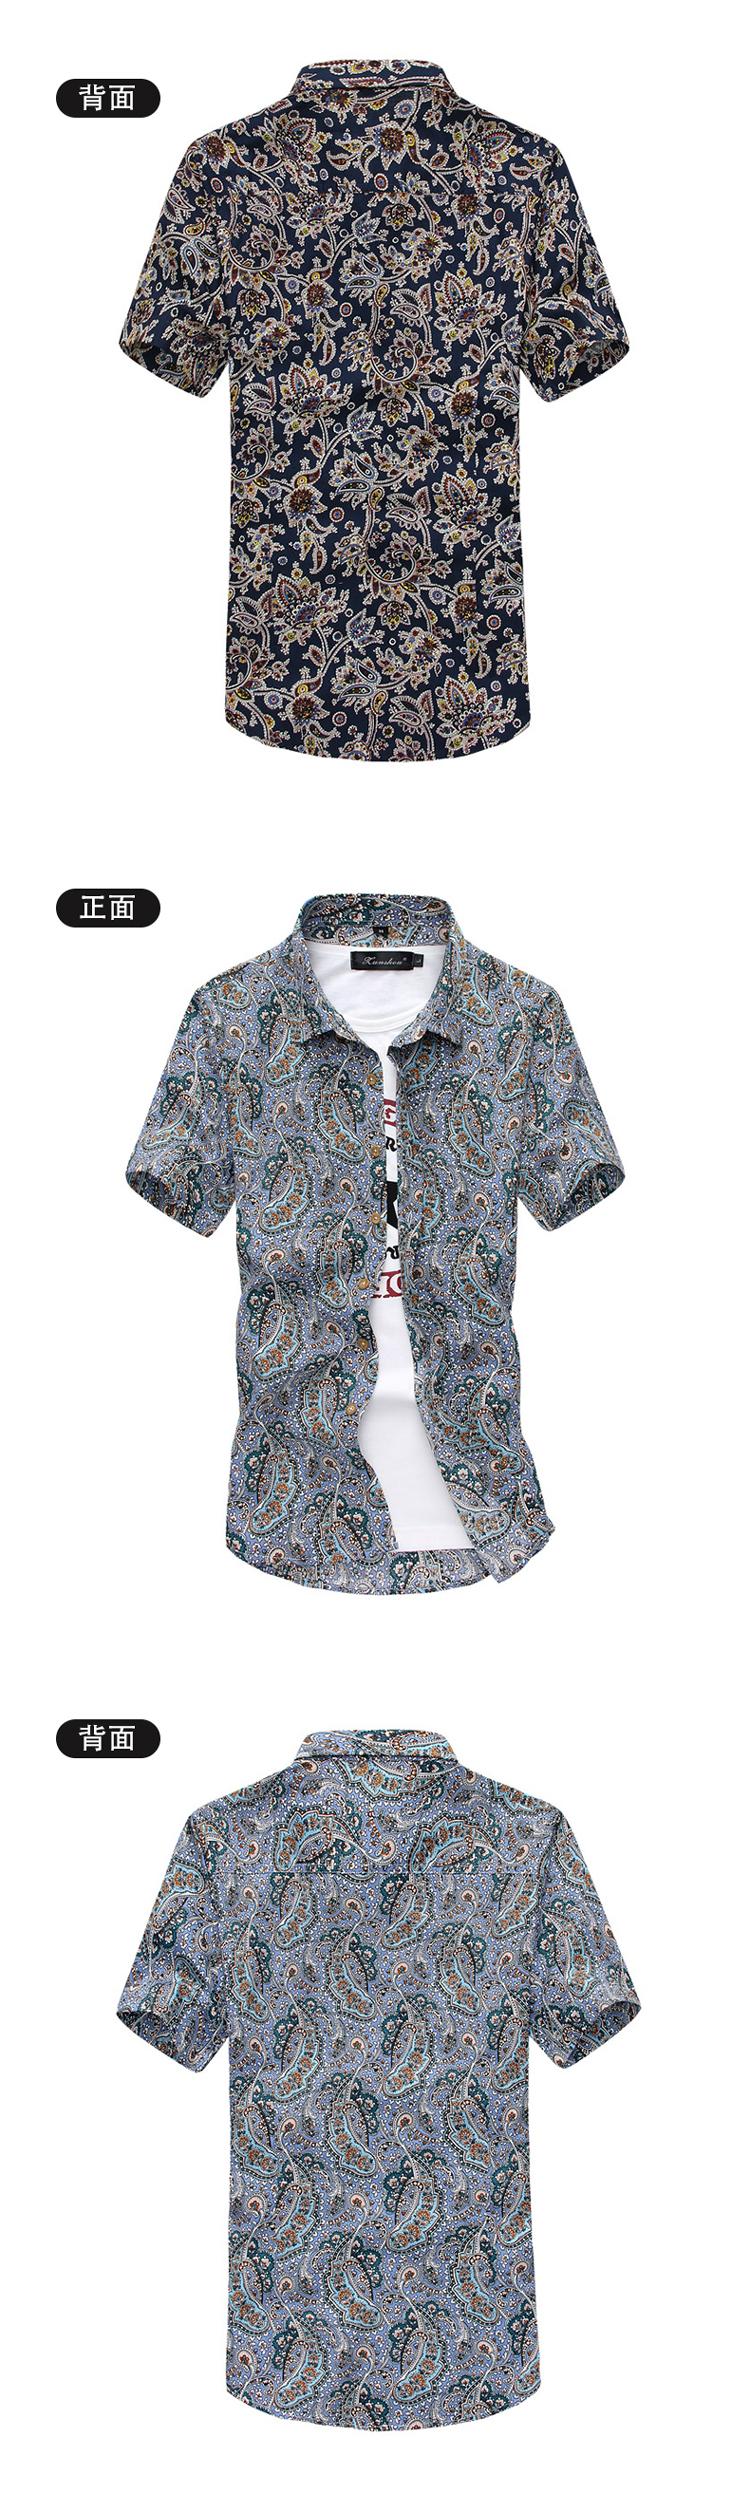 Men Summer Thin Shirts Short Sleeve Floral Shirts New Fashion Men Outwear Casual Slim Shirts Mens Cotton dress shirts 9 Online shopping Bangladesh